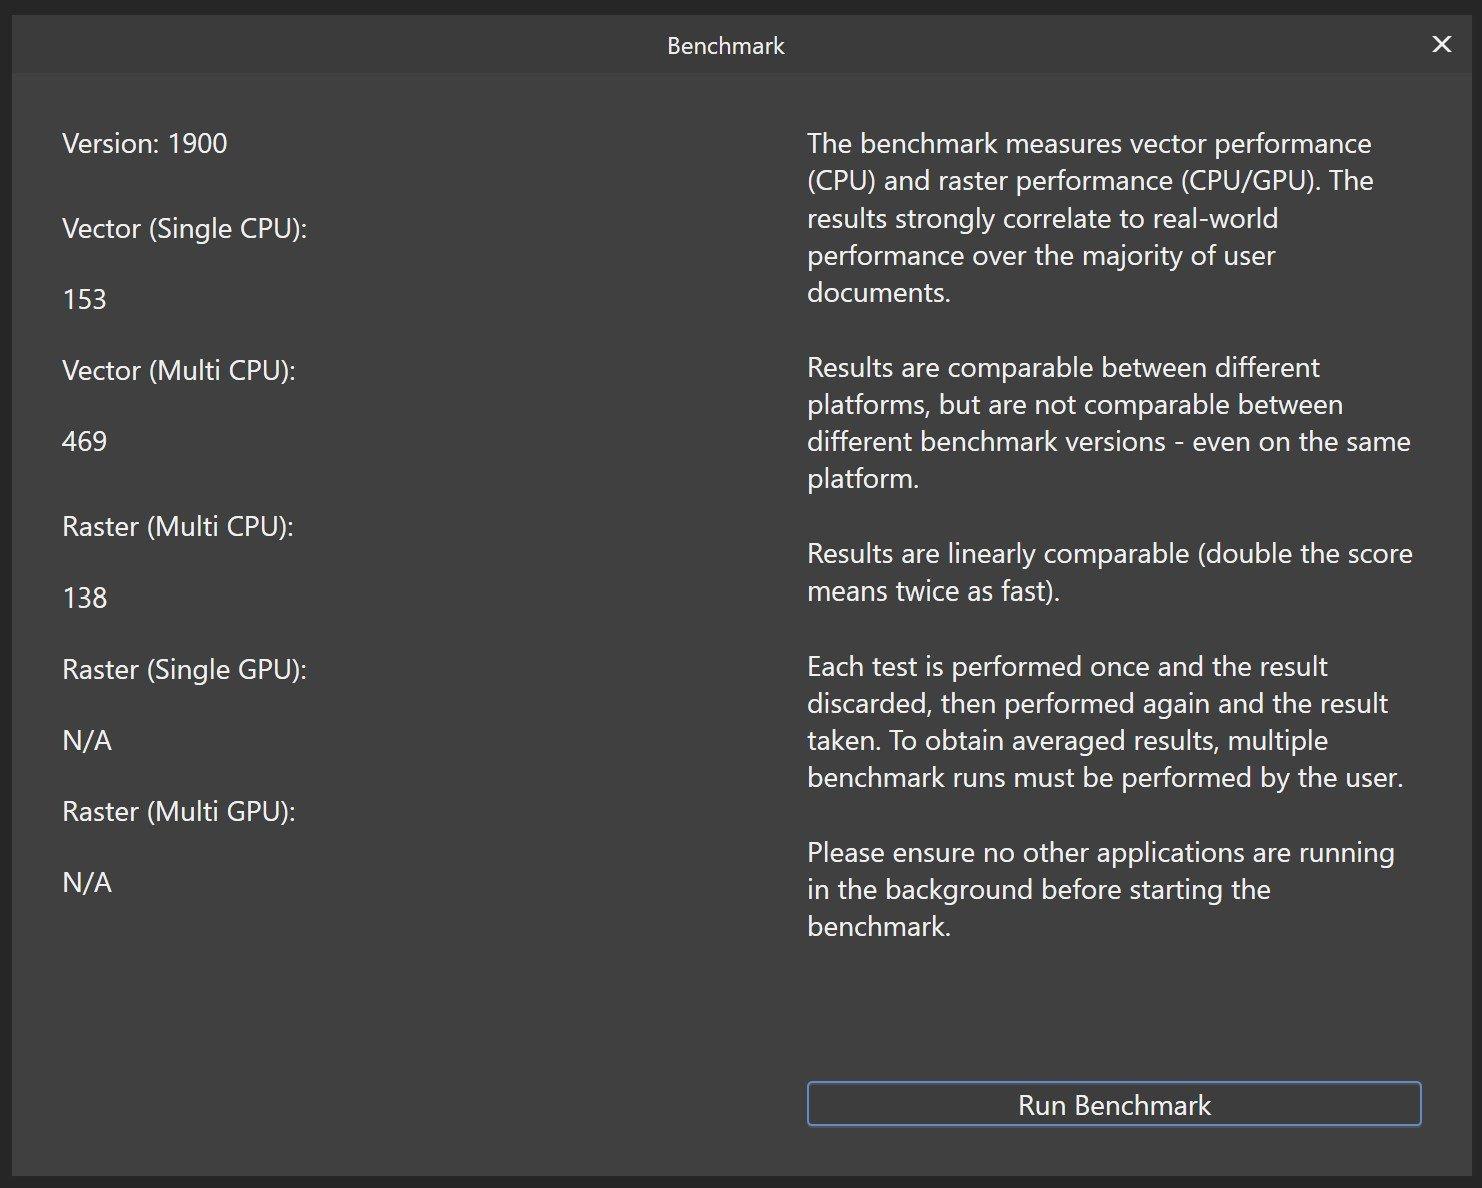 benchmark.jpg.c7bfb1a7a226c40126d141111dc217d8.jpg